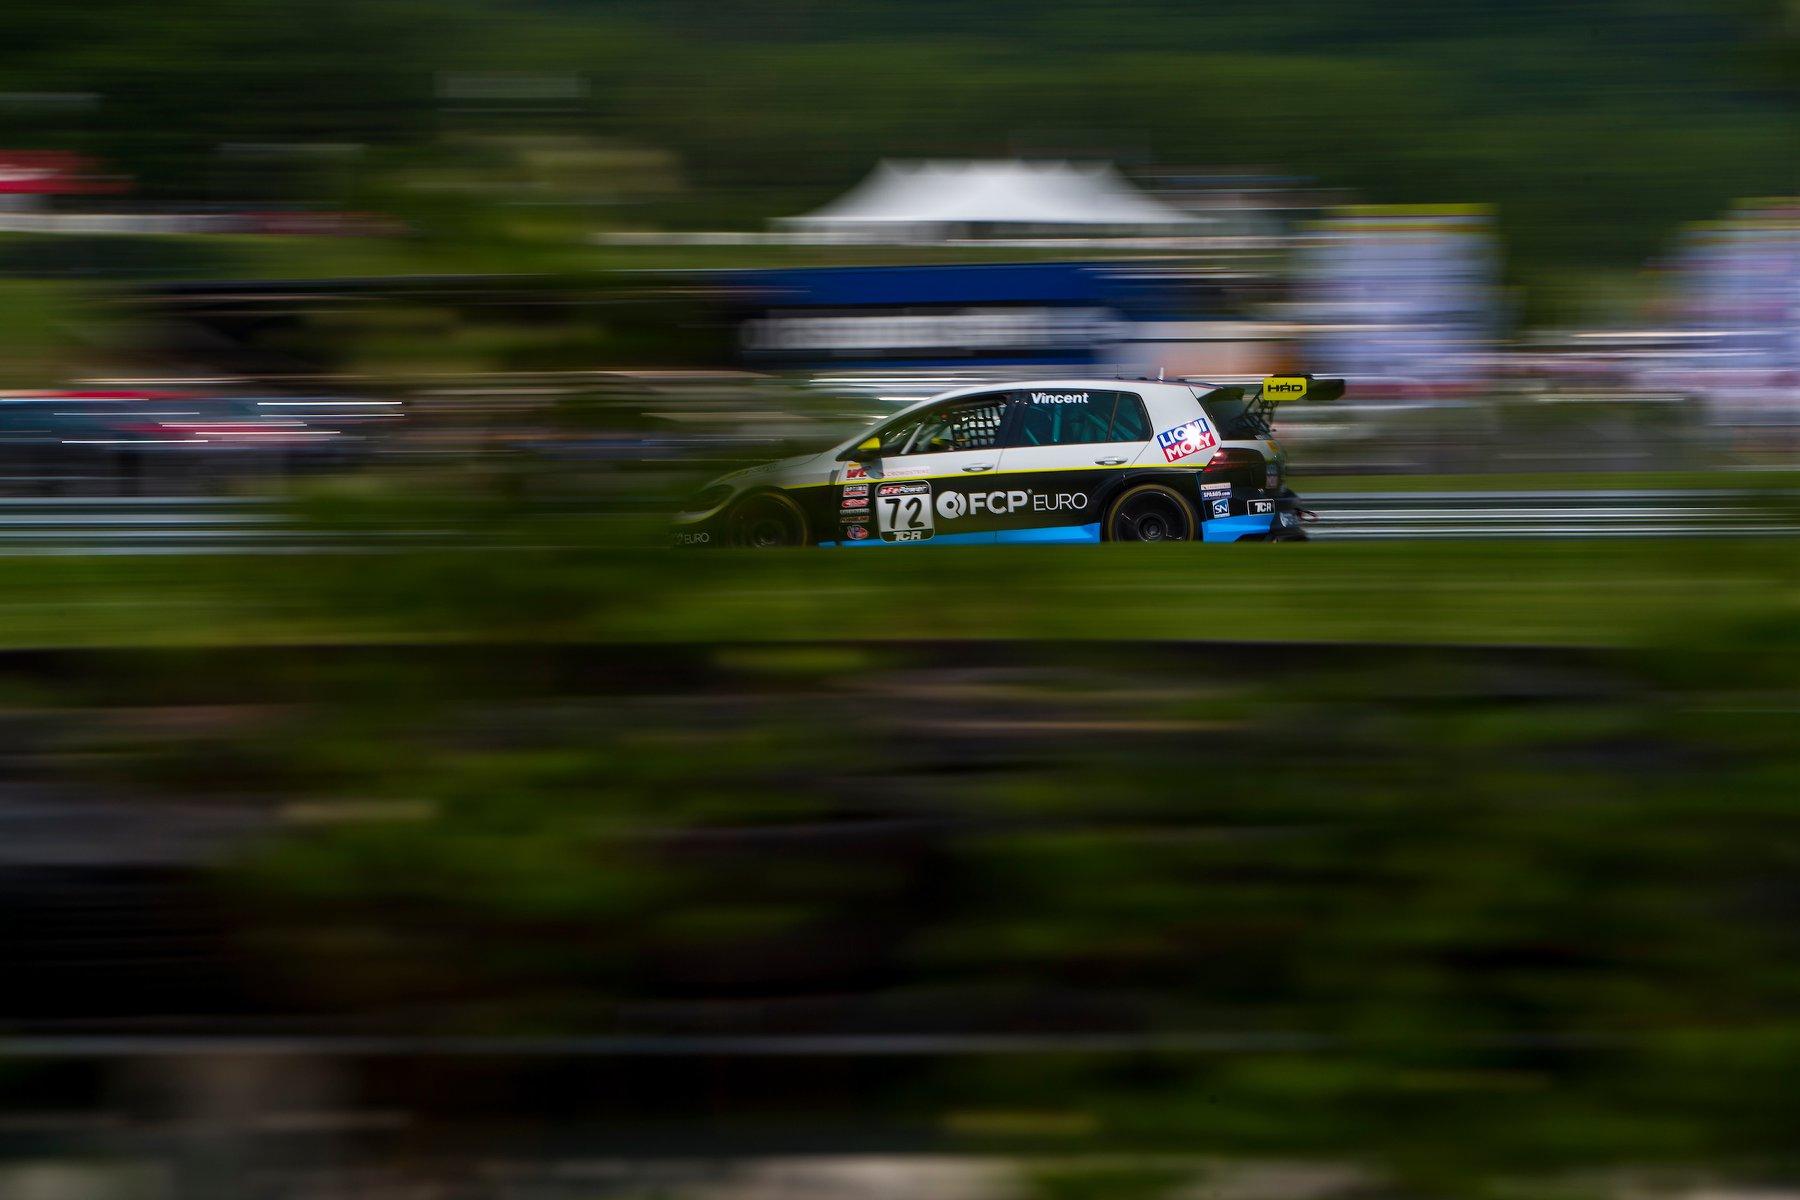 2018-Volkswagen-GTI-TCR-Lime-Rock-Park-10